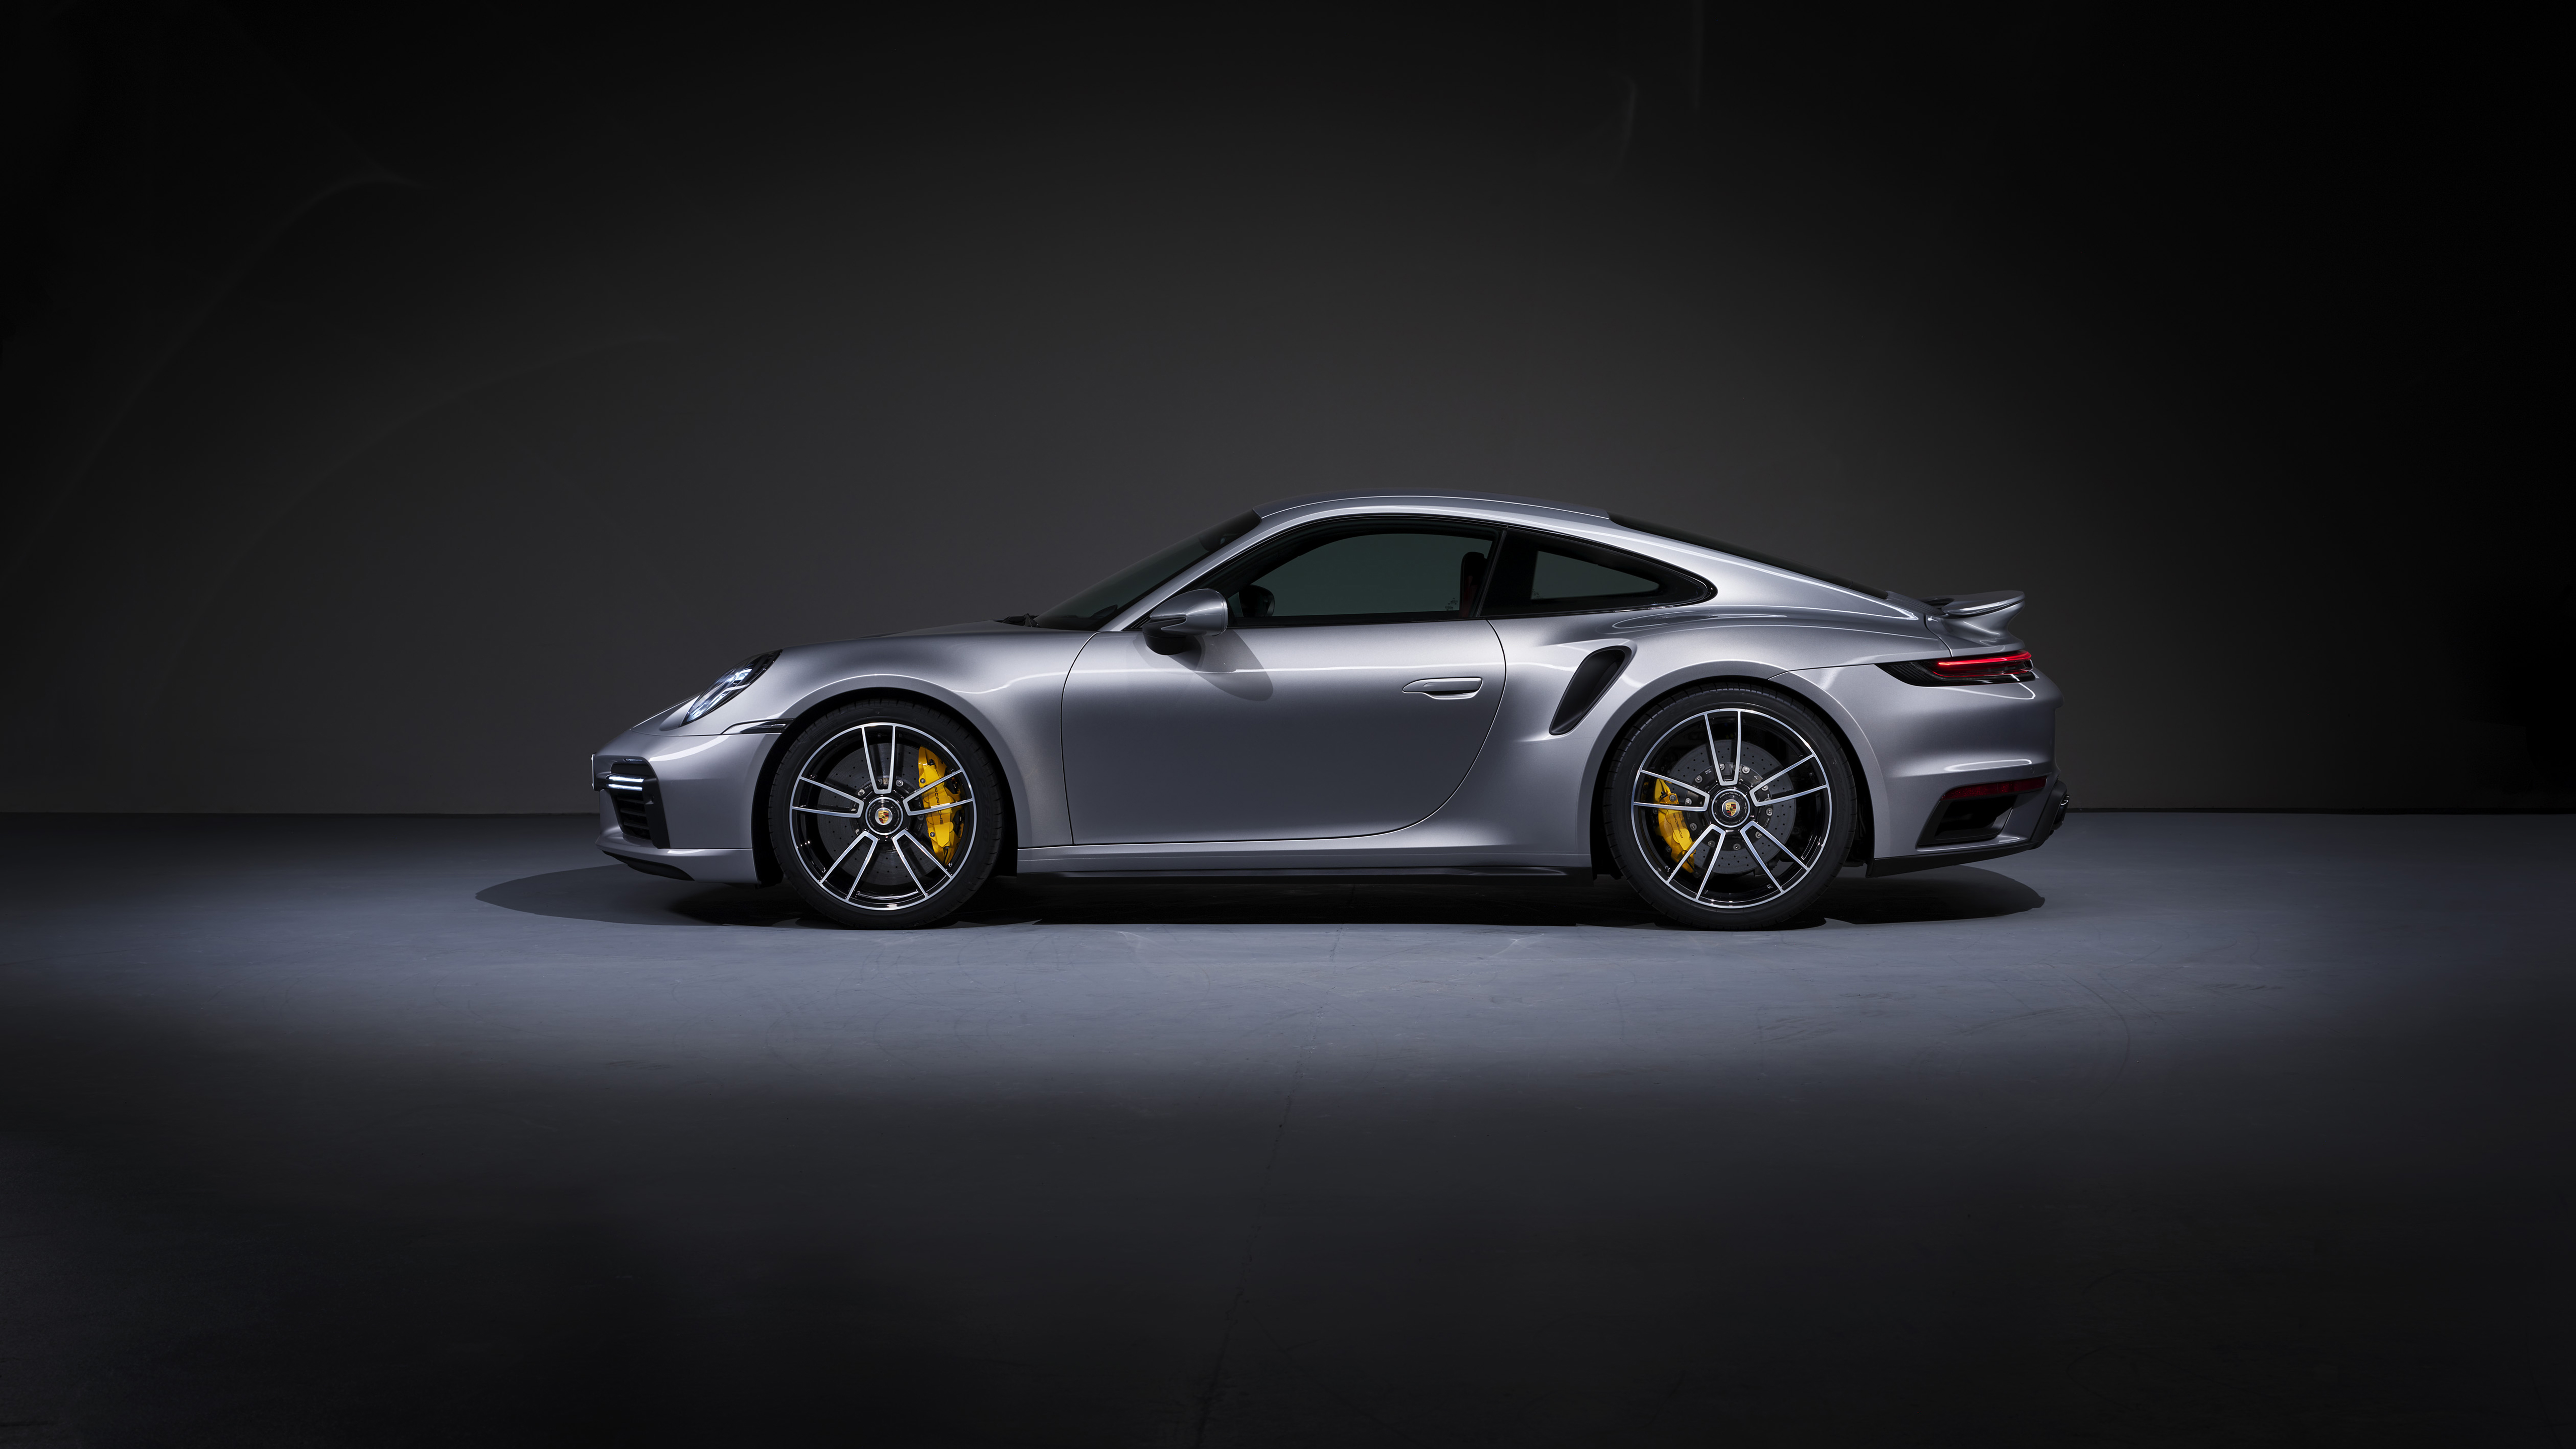 Porsche 911 Turbo S 2020 5K 11 Wallpaper HD Car Wallpapers ID 5120x2880